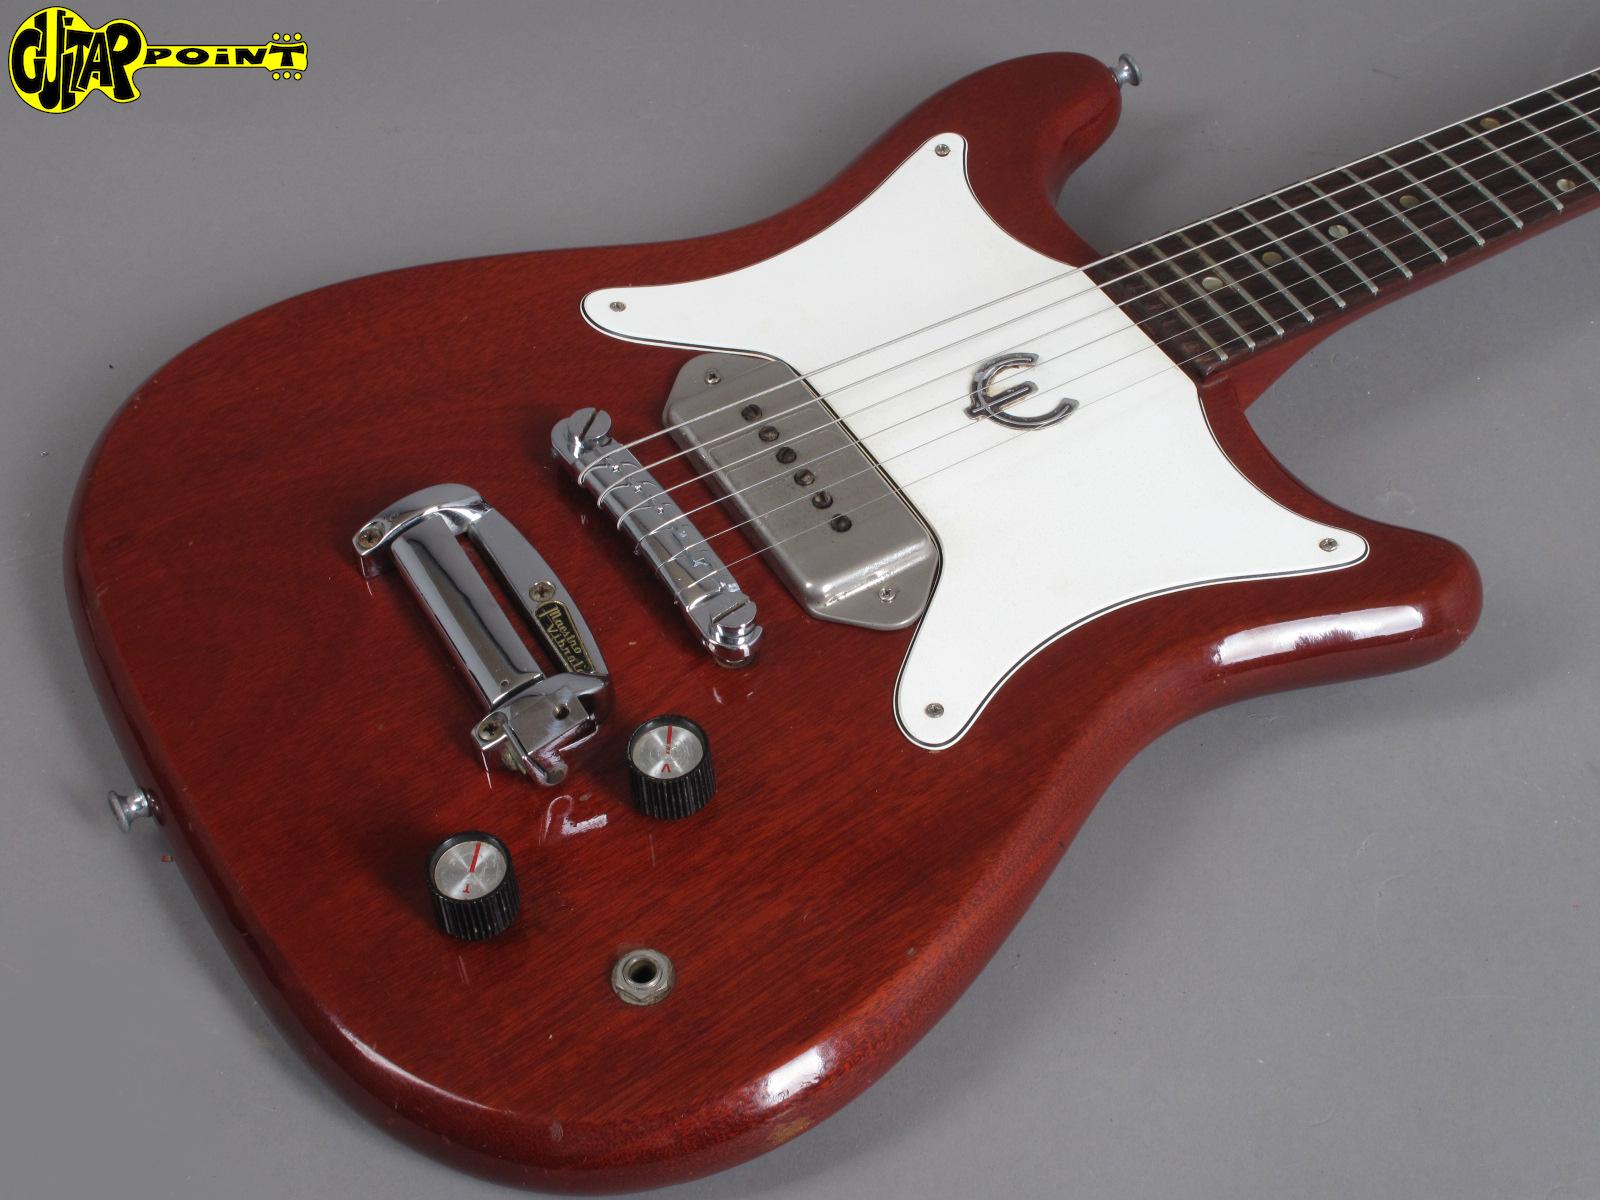 https://guitarpoint.de/app/uploads/products/1965-epiphone-coronet-cherry/Epiphone65CoroCH515919_8.jpg